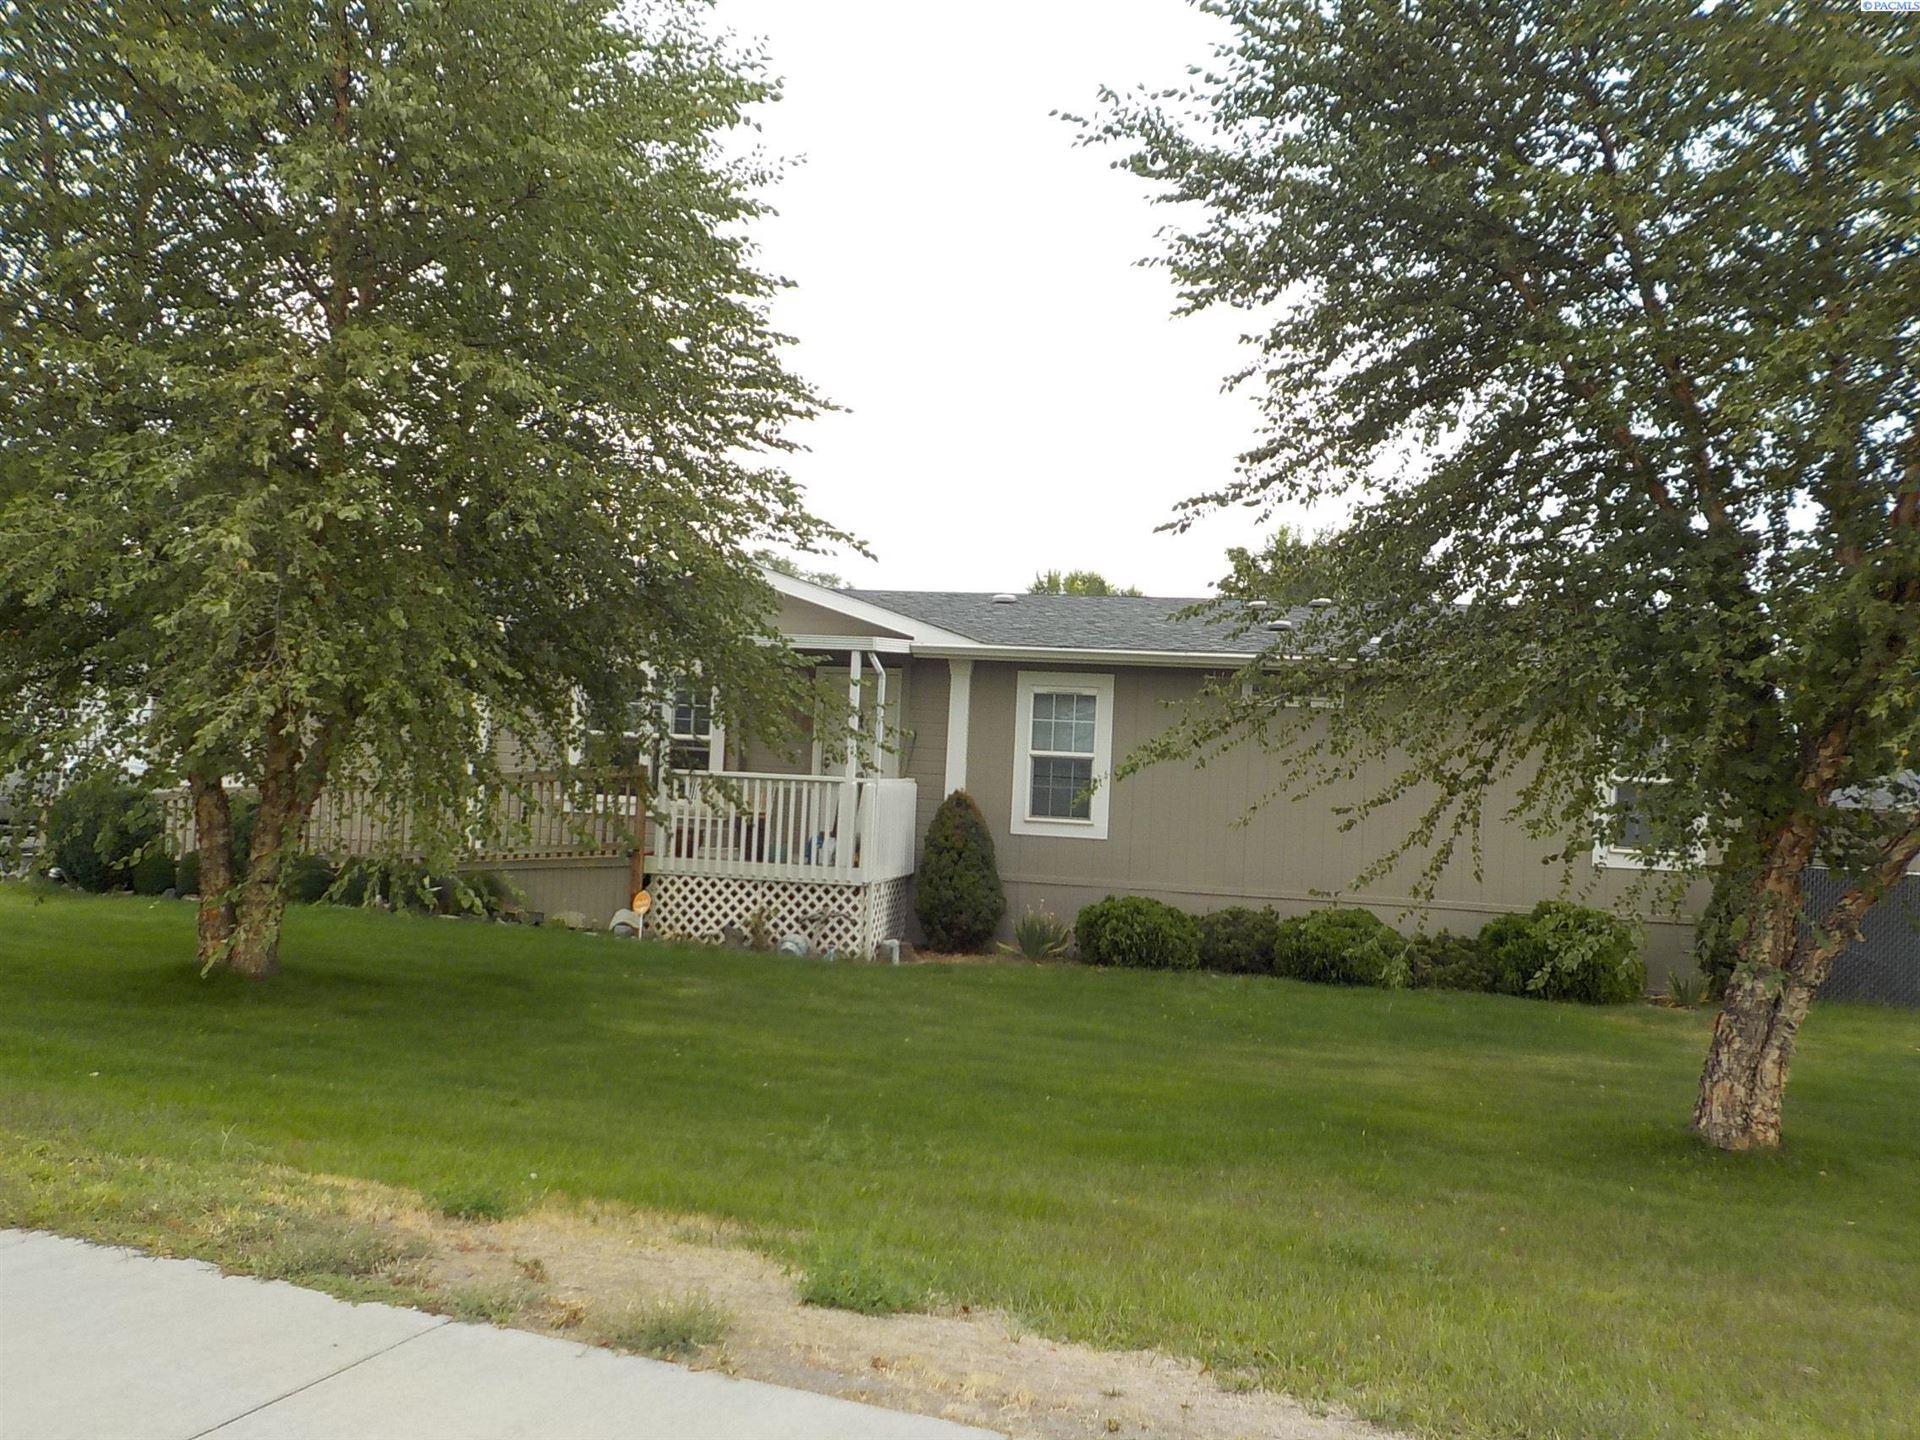 Photo of 5616 Deer Street, West Richland, WA 99353 (MLS # 256644)